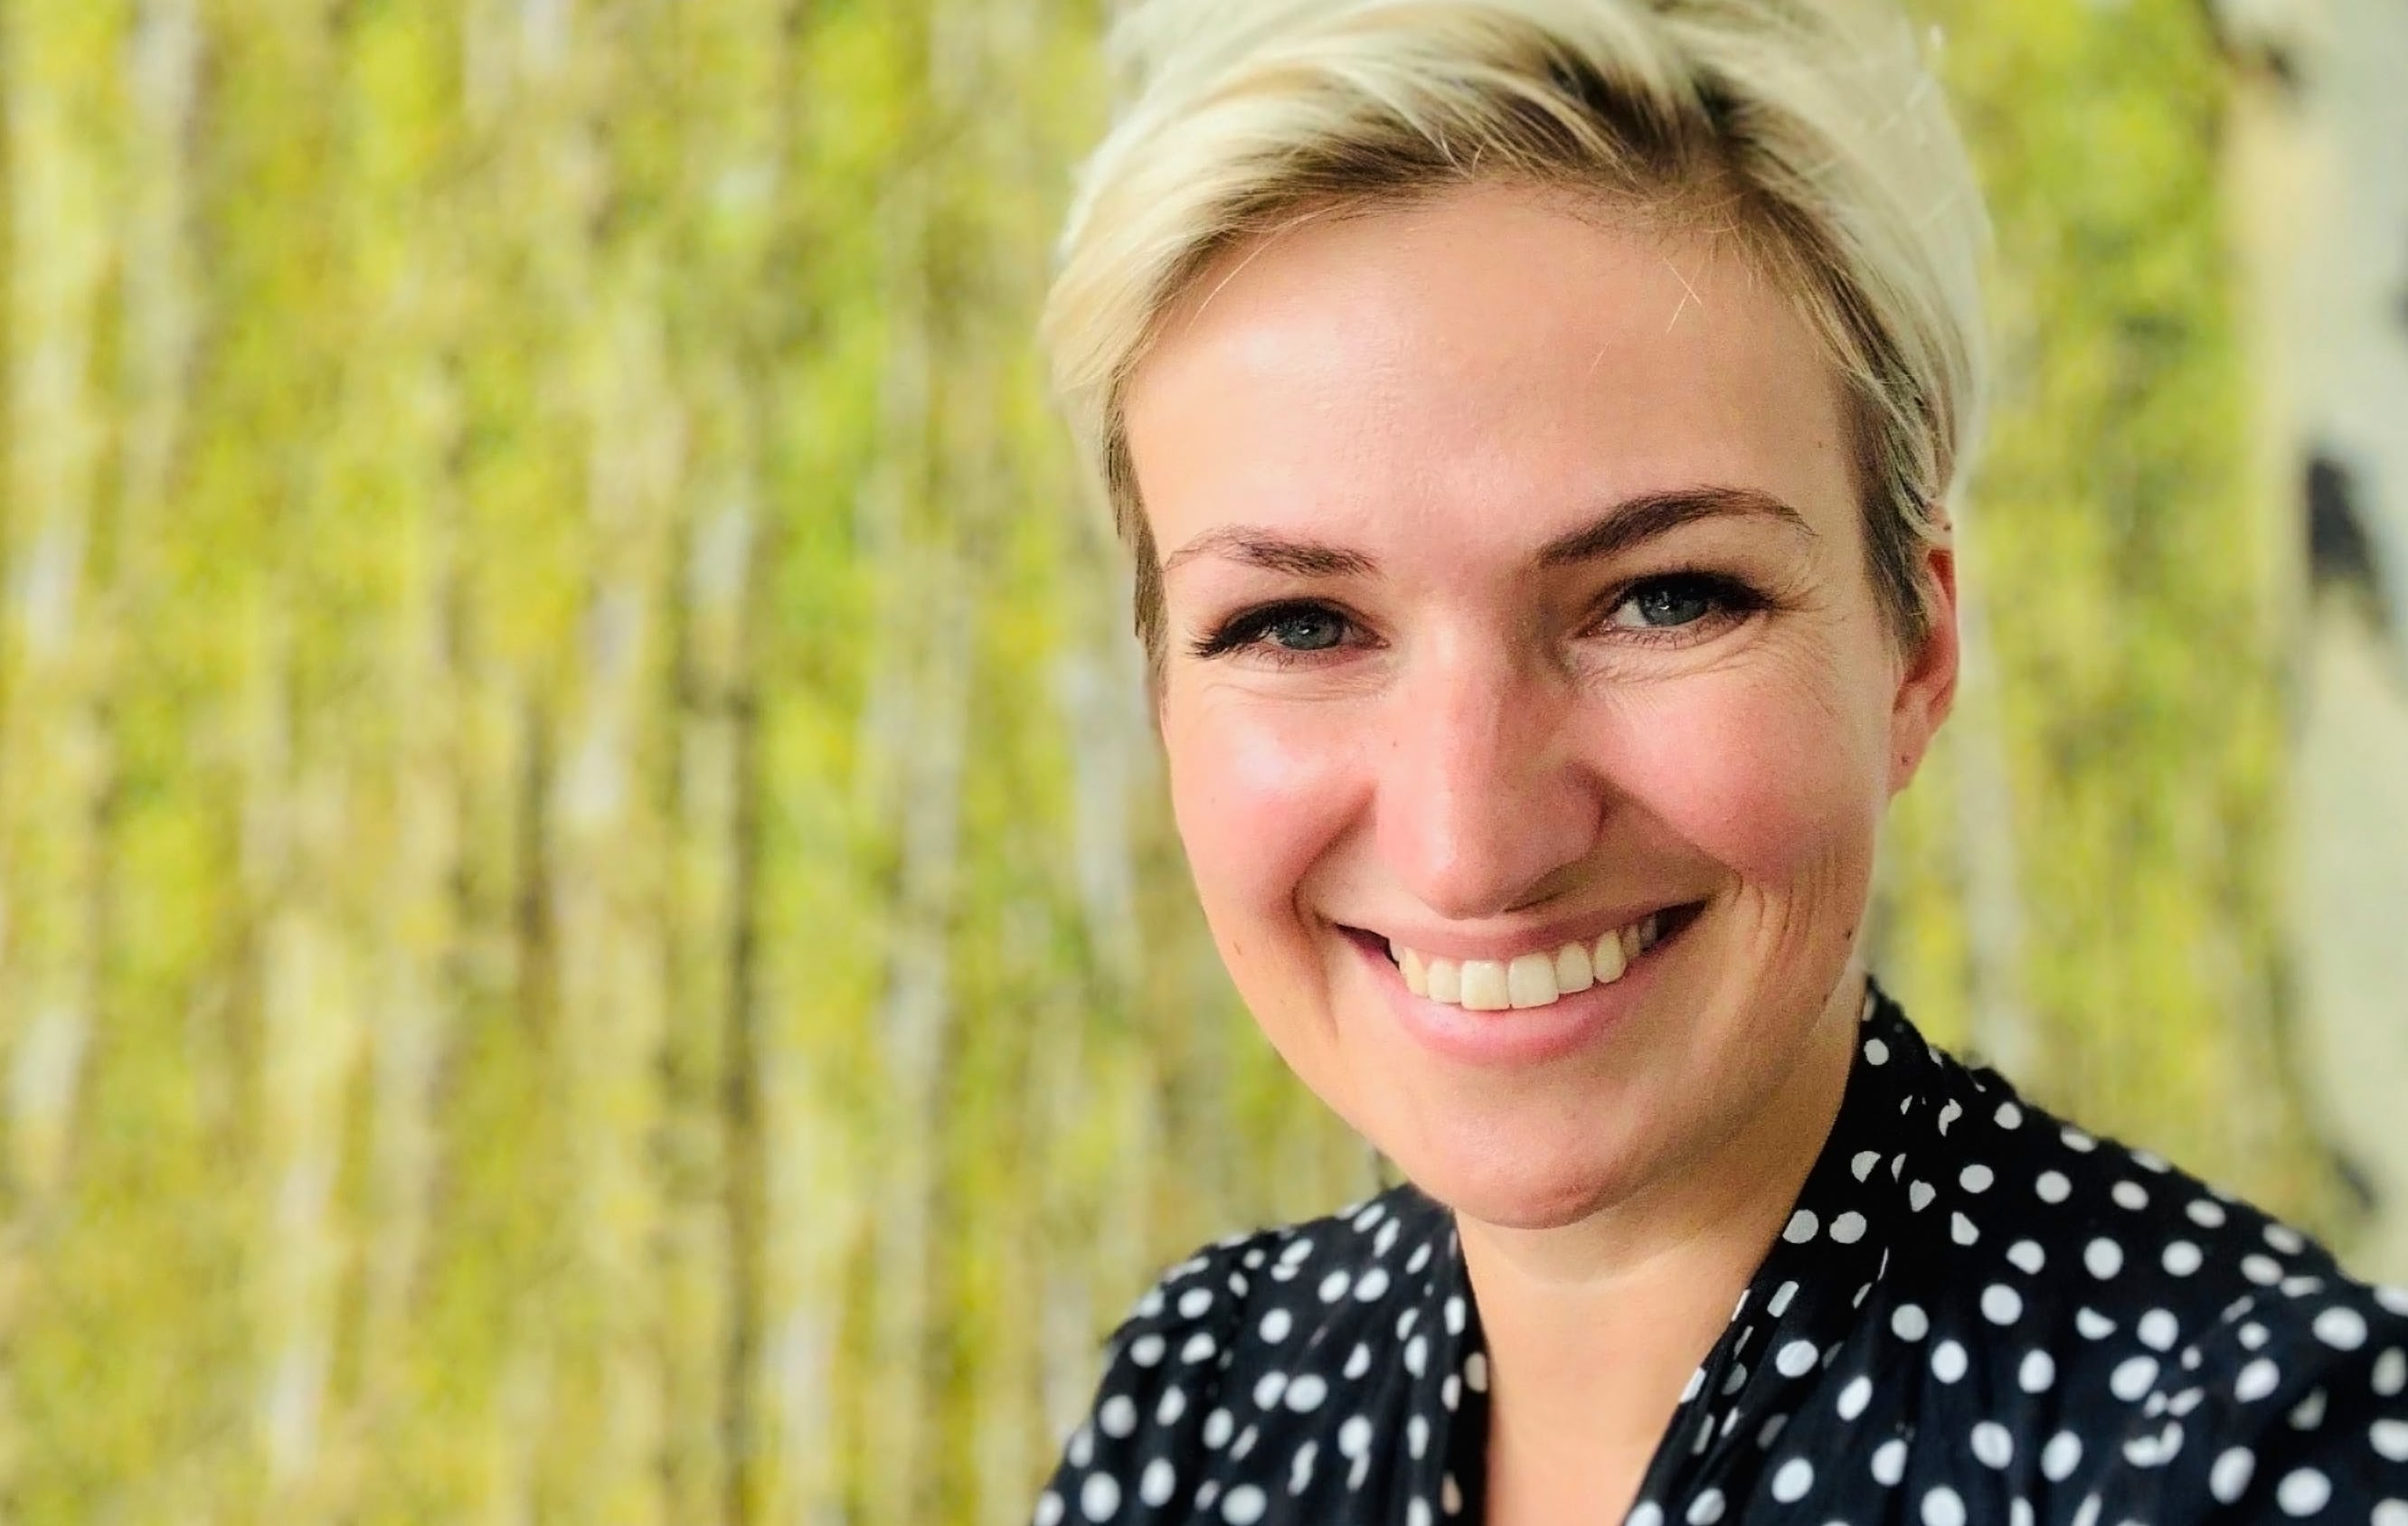 Marketplace community-building playbook – Julia Wadehn, COO of PaulCamper